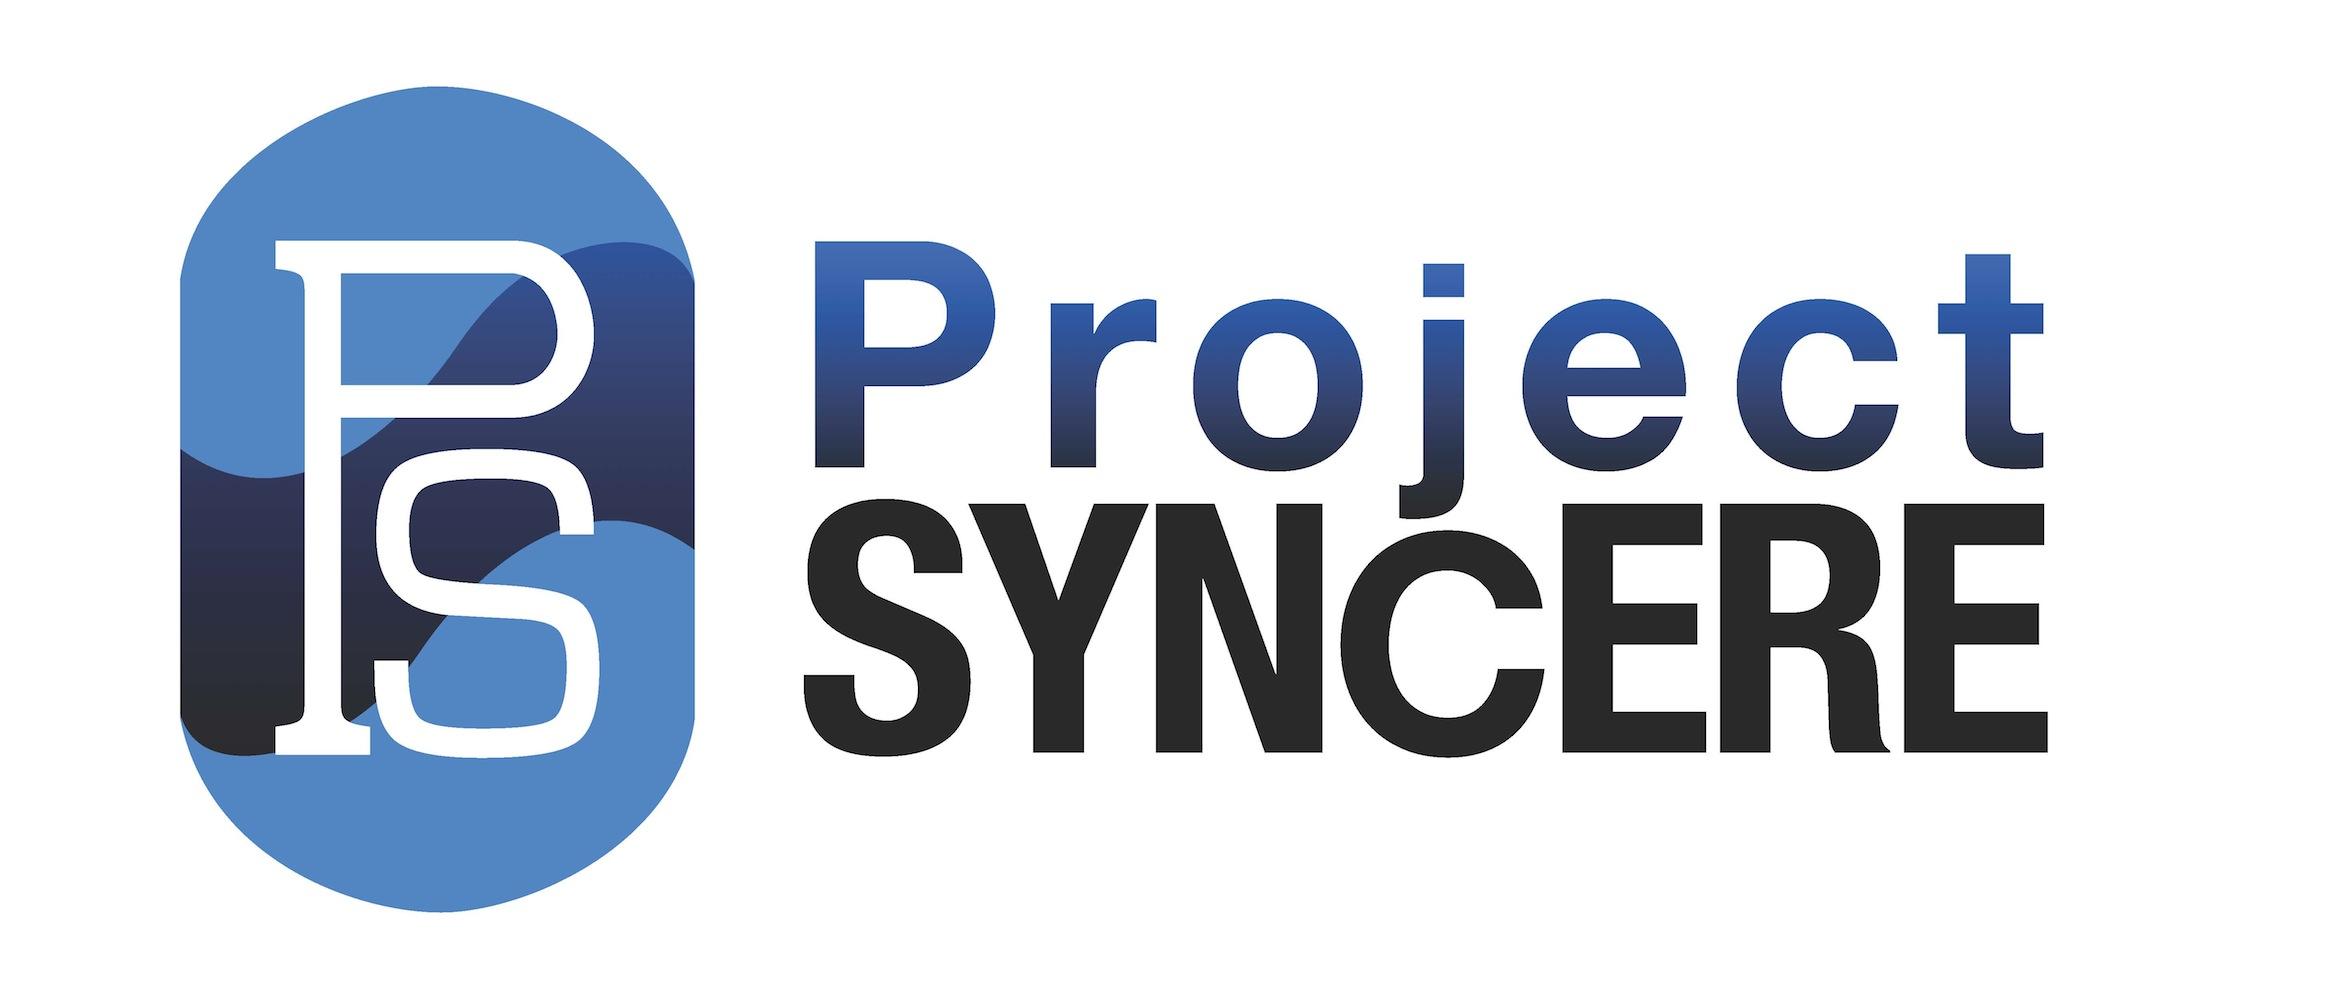 projectsyncere.jpg